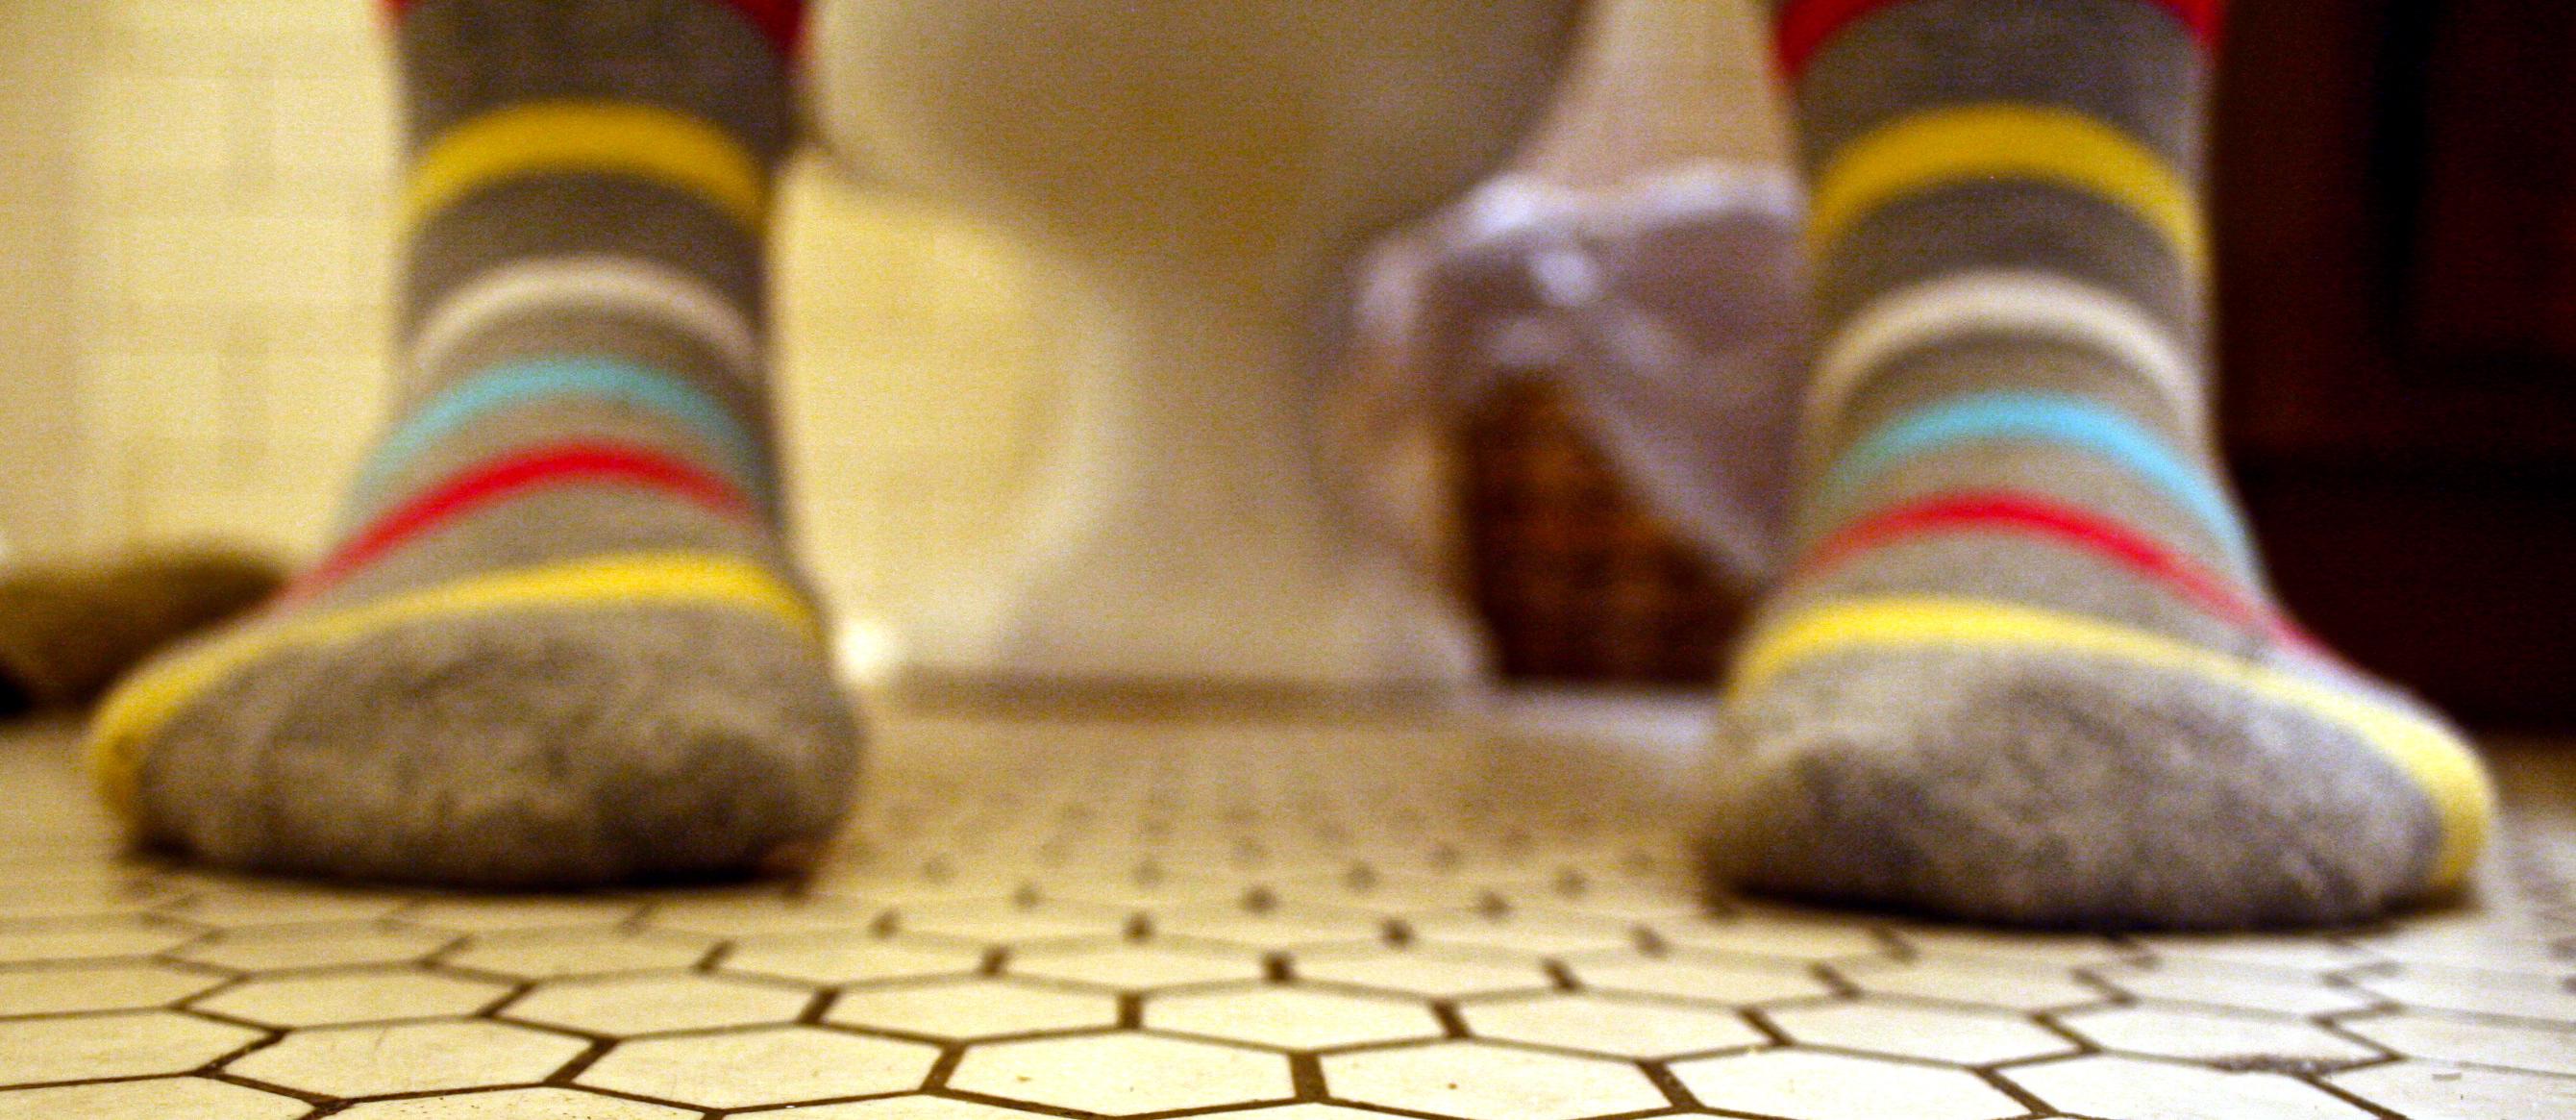 Bowel movements the scoop on poop